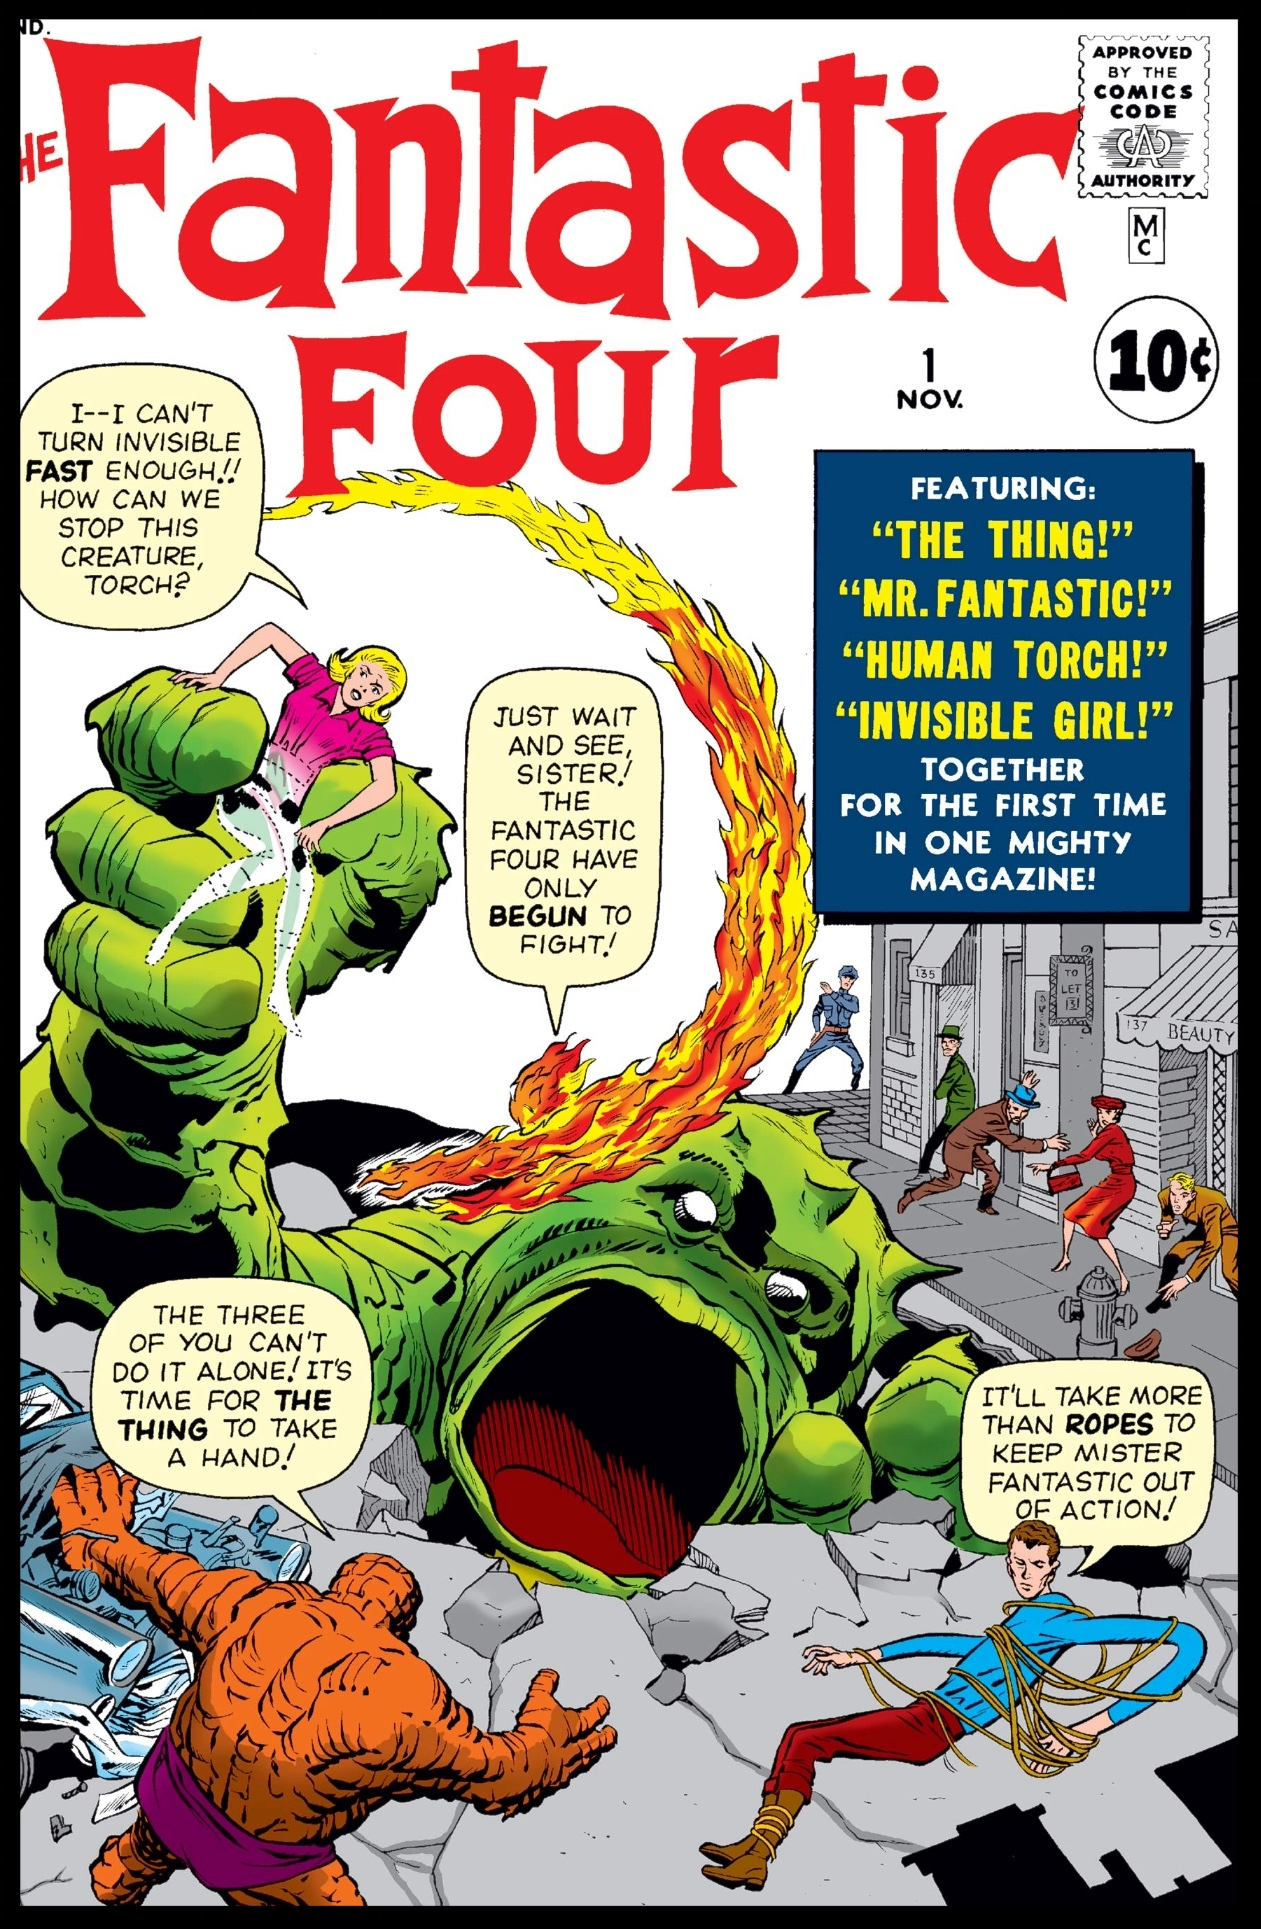 Fantastic Four (1961) #1 Cover